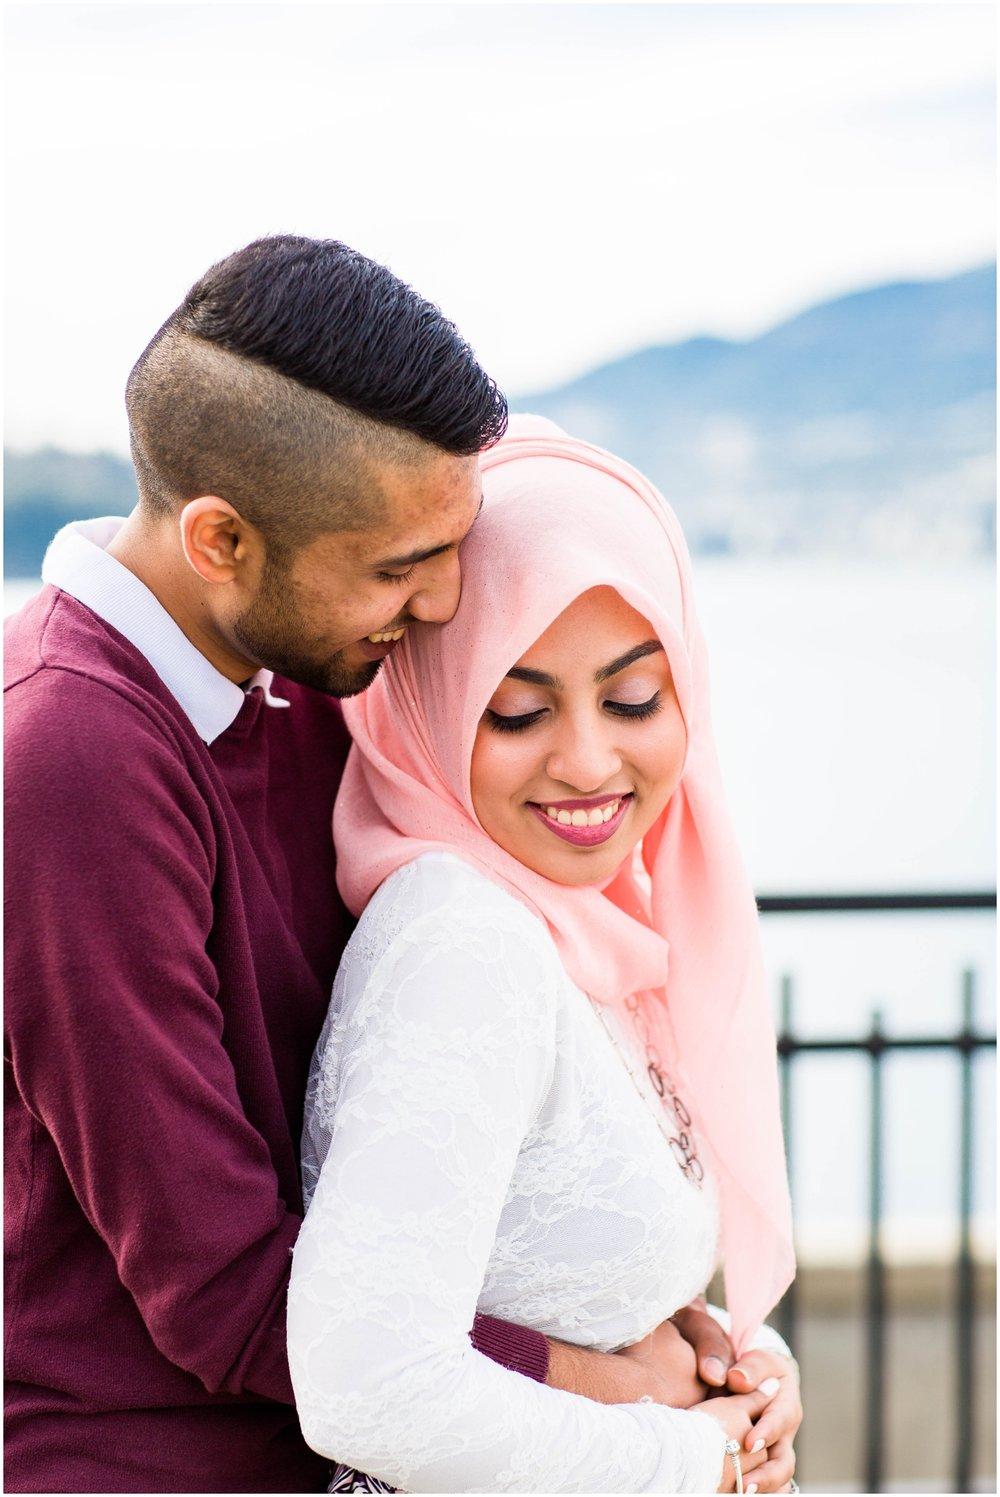 Stanley-Park-Engagement-Vancouver-Toronto-Mississauga-GTA-Pakistani-Indian-Wedding-Photography-Photographer_0071.jpg